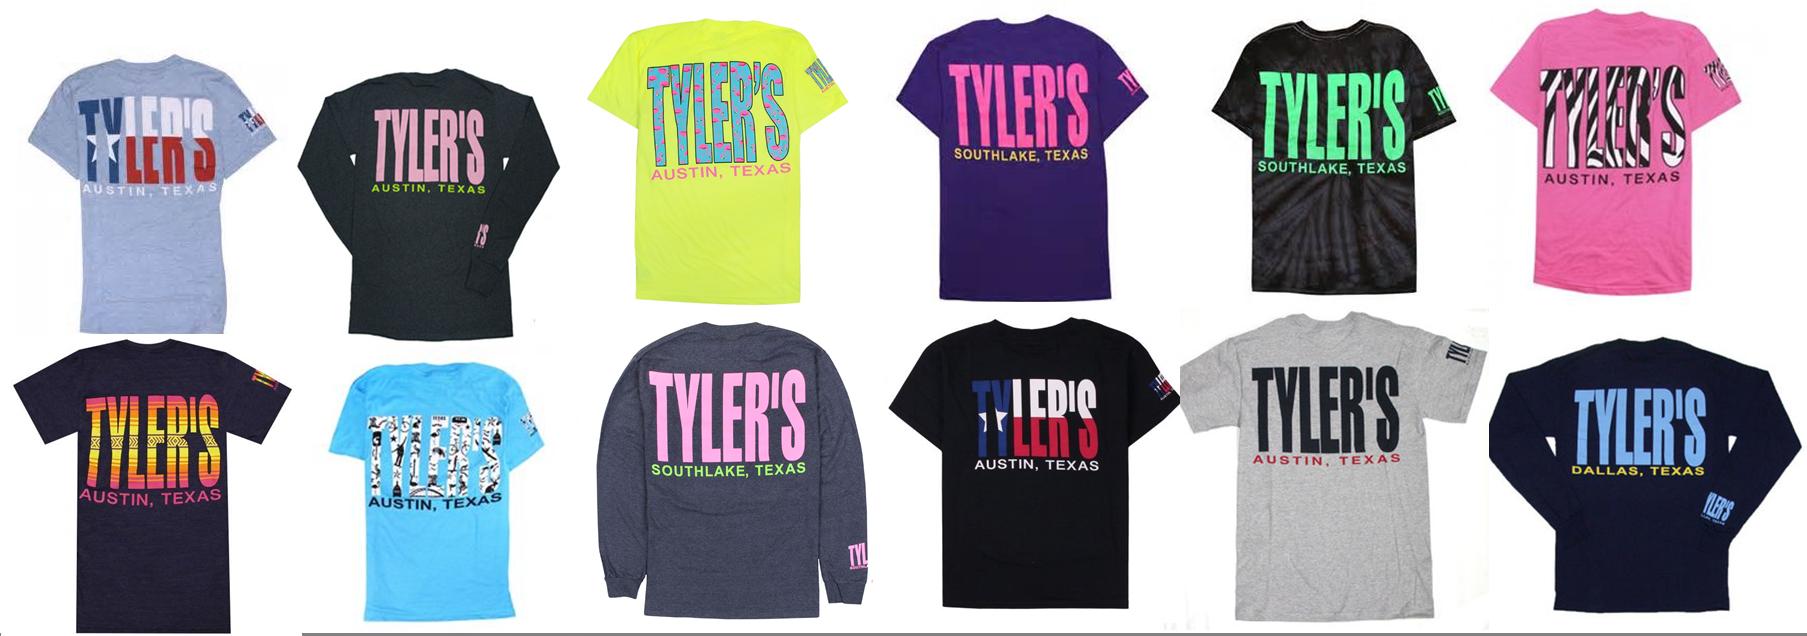 LifestyleFood TshirtsIt's Tylers Hou Tx Houston Not Me w0knOP